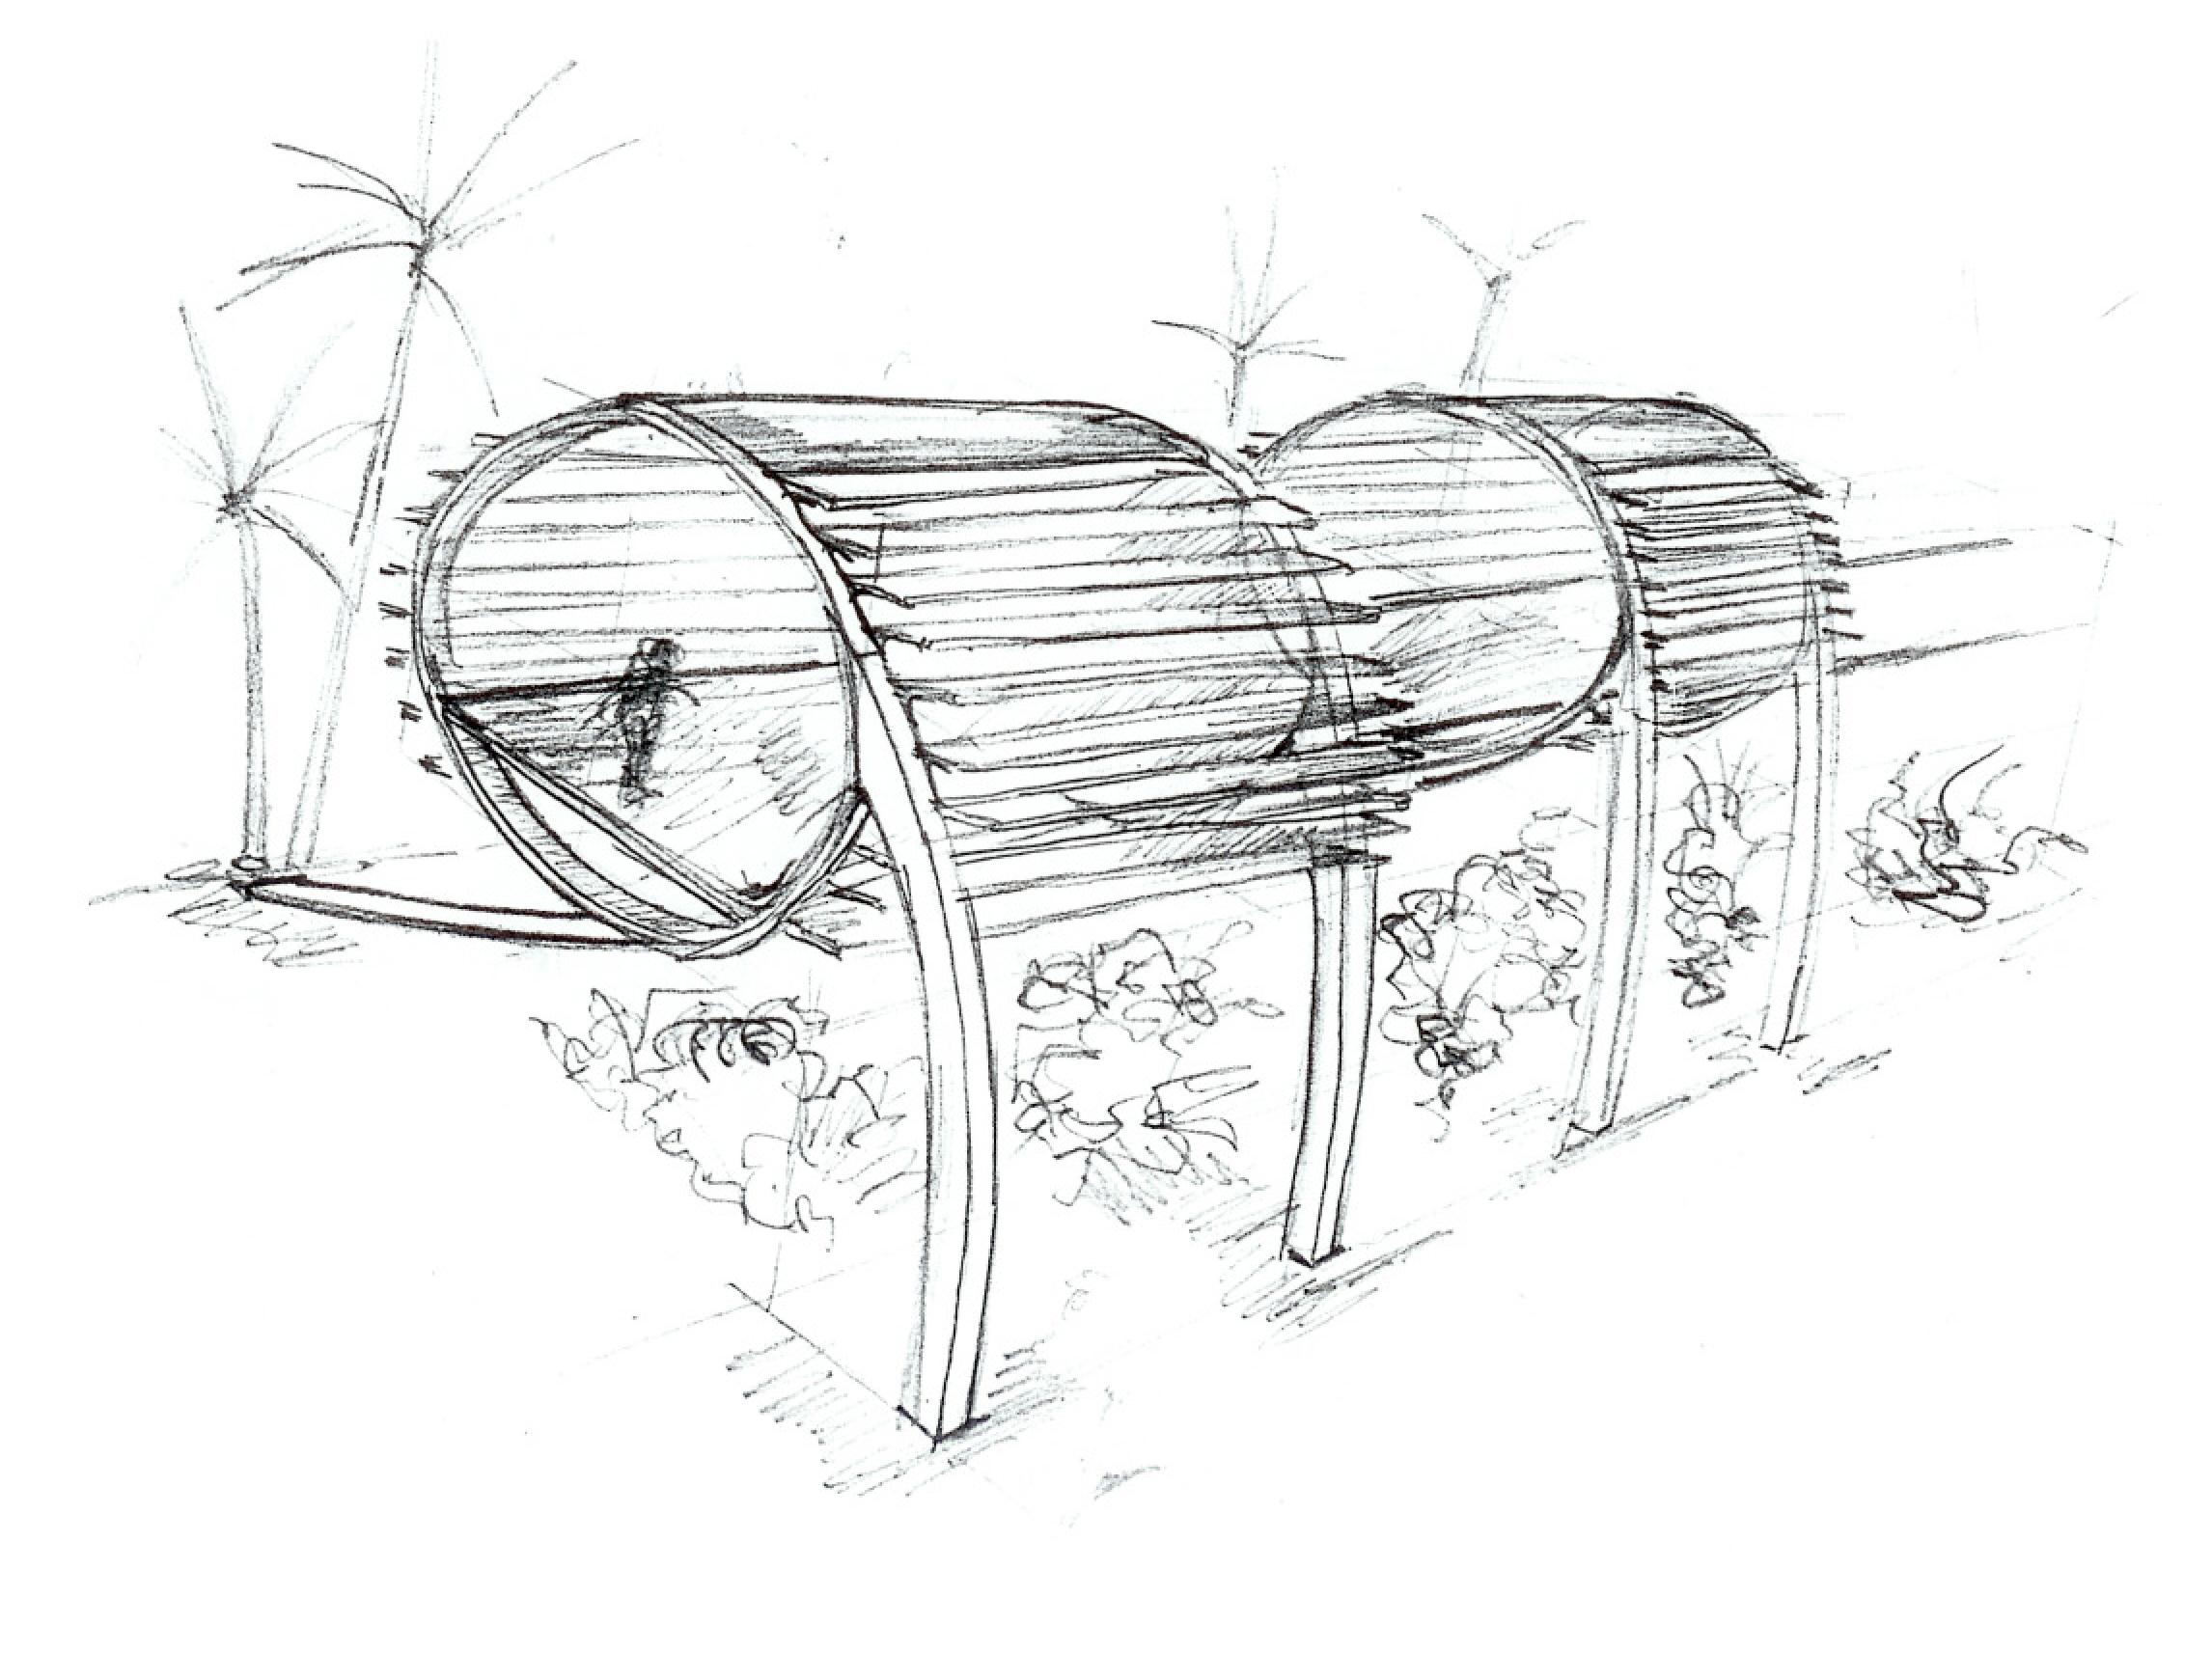 Iguana Ecolodge Sketch | Architectural Design Process